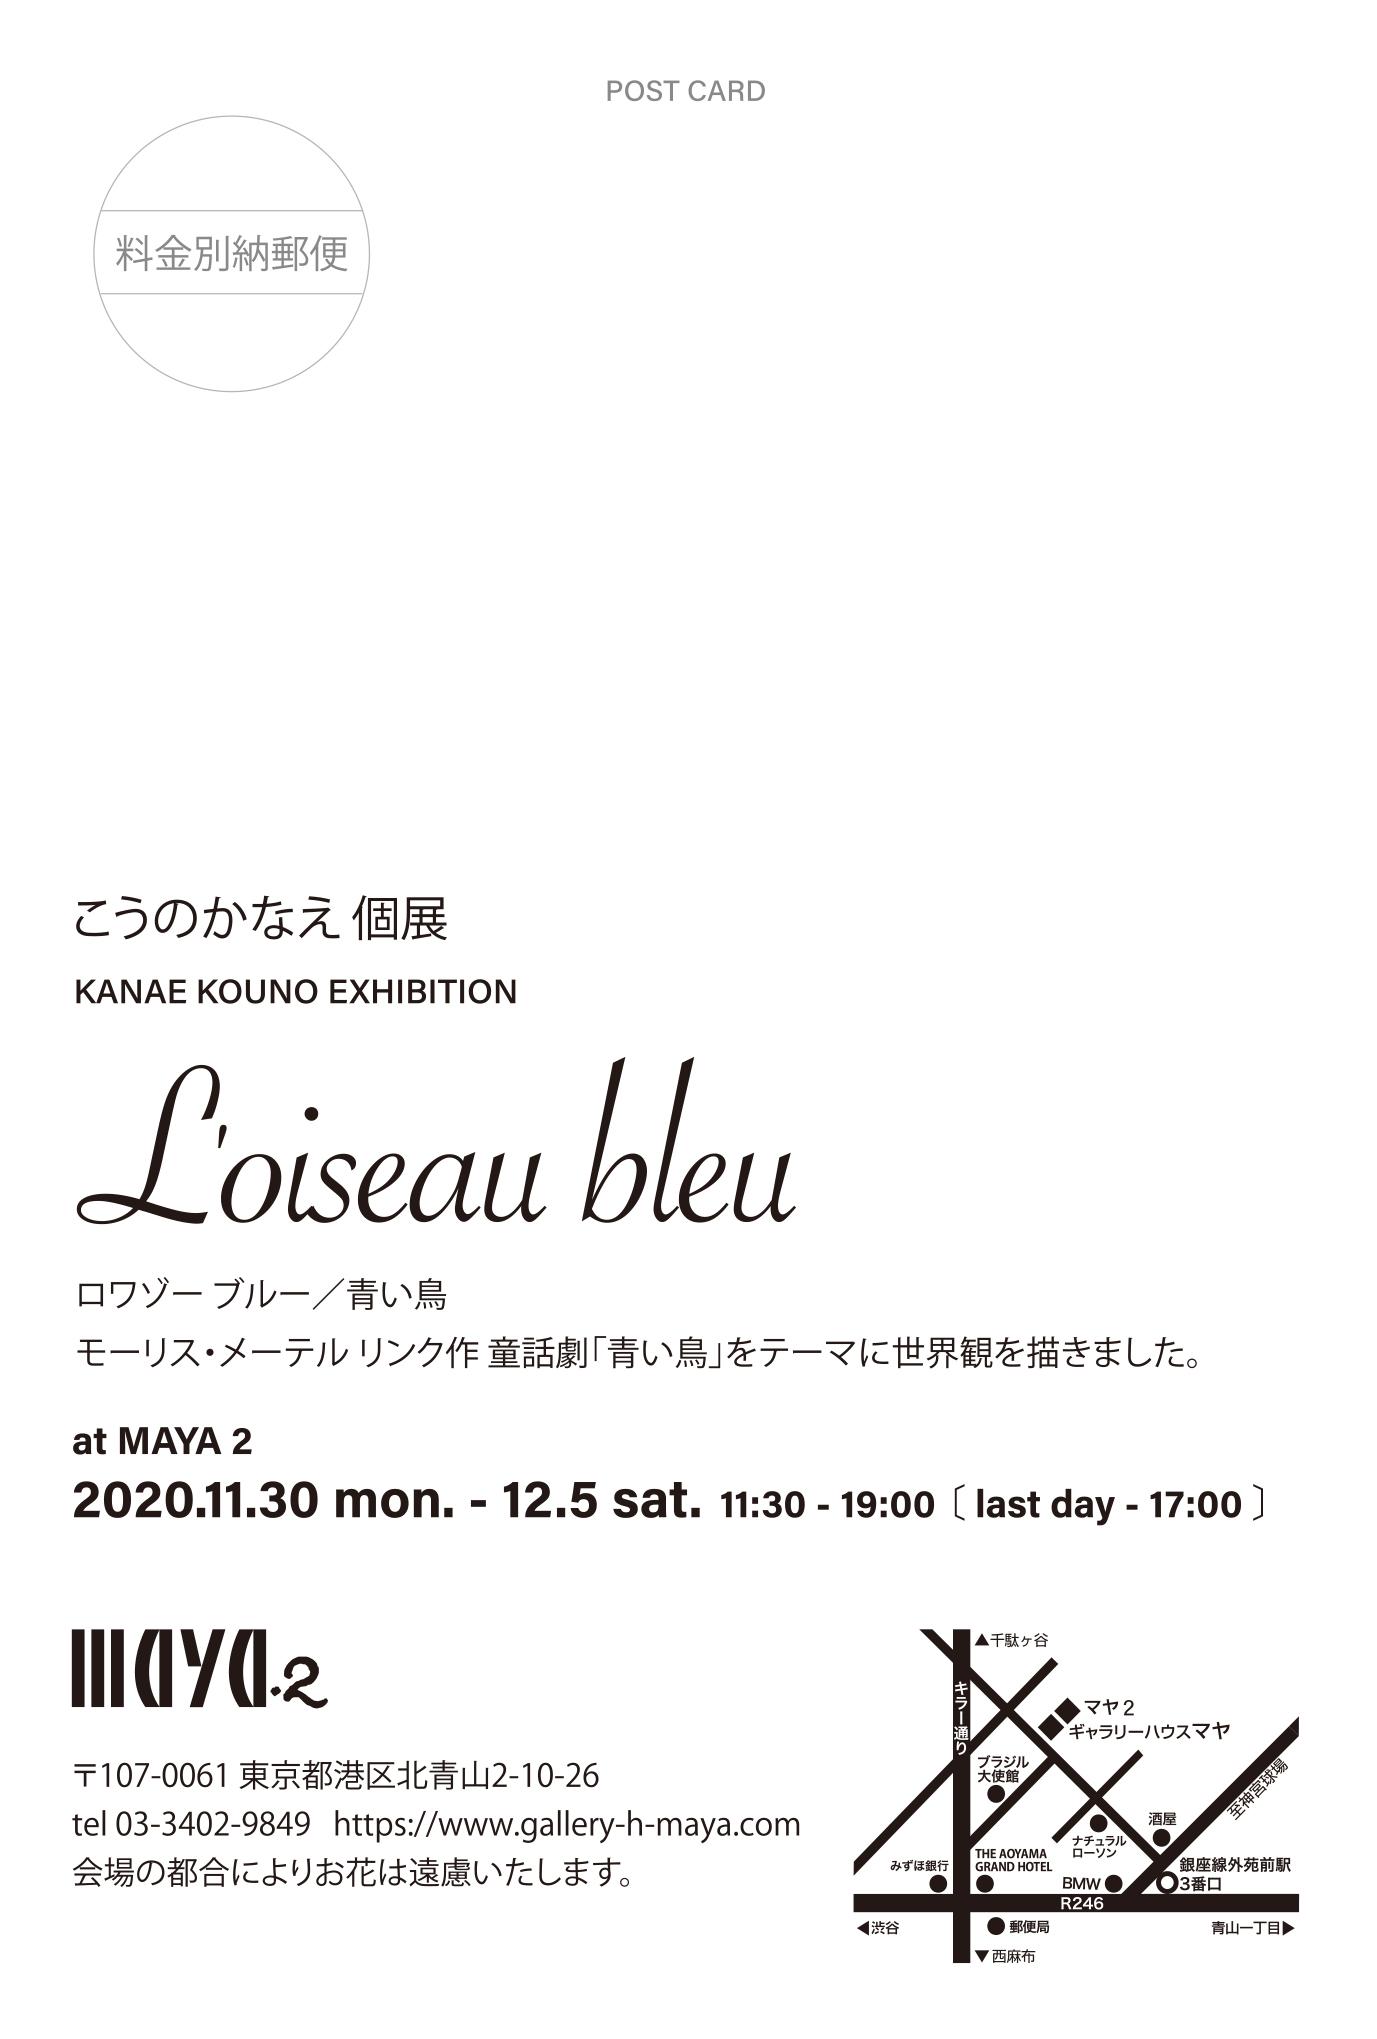 2020dm blog2 【展示のお知らせ】Loiseau bleu